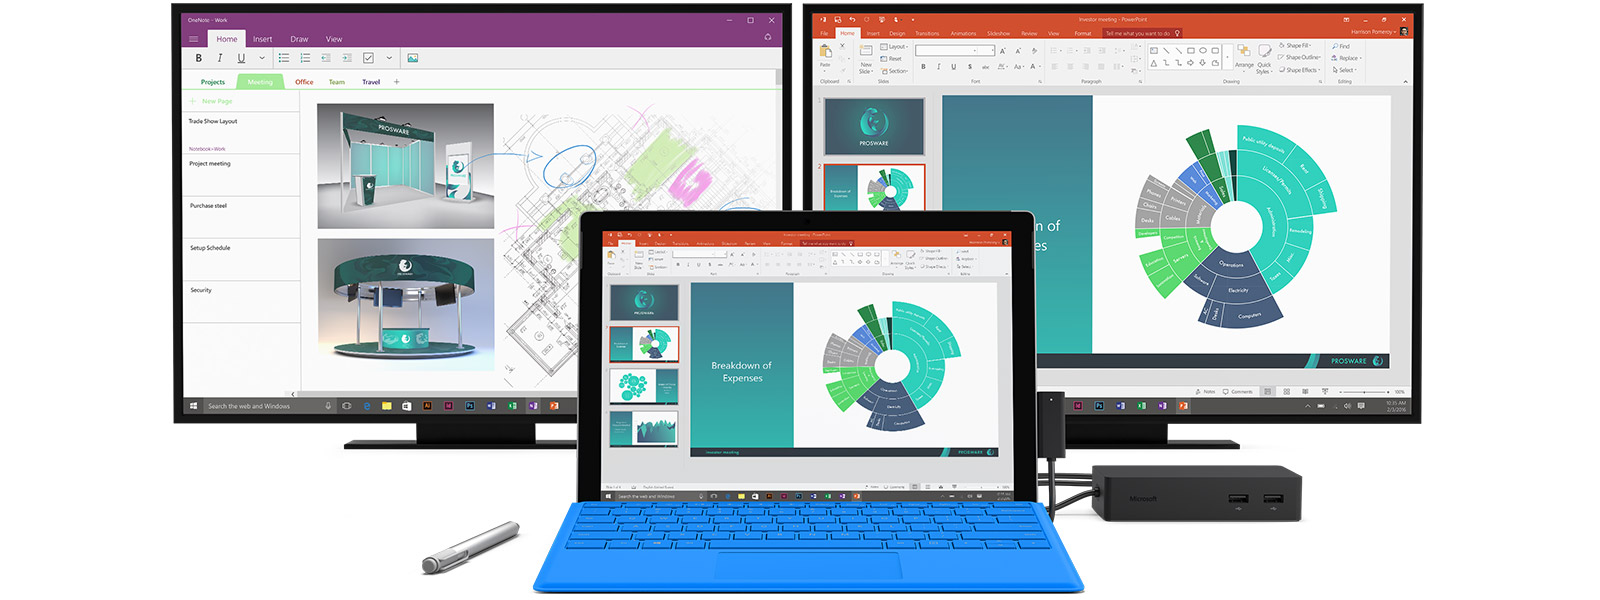 Dua monitor desktop generik, Surface Pro 4, Pen Surface dan Dok Surface